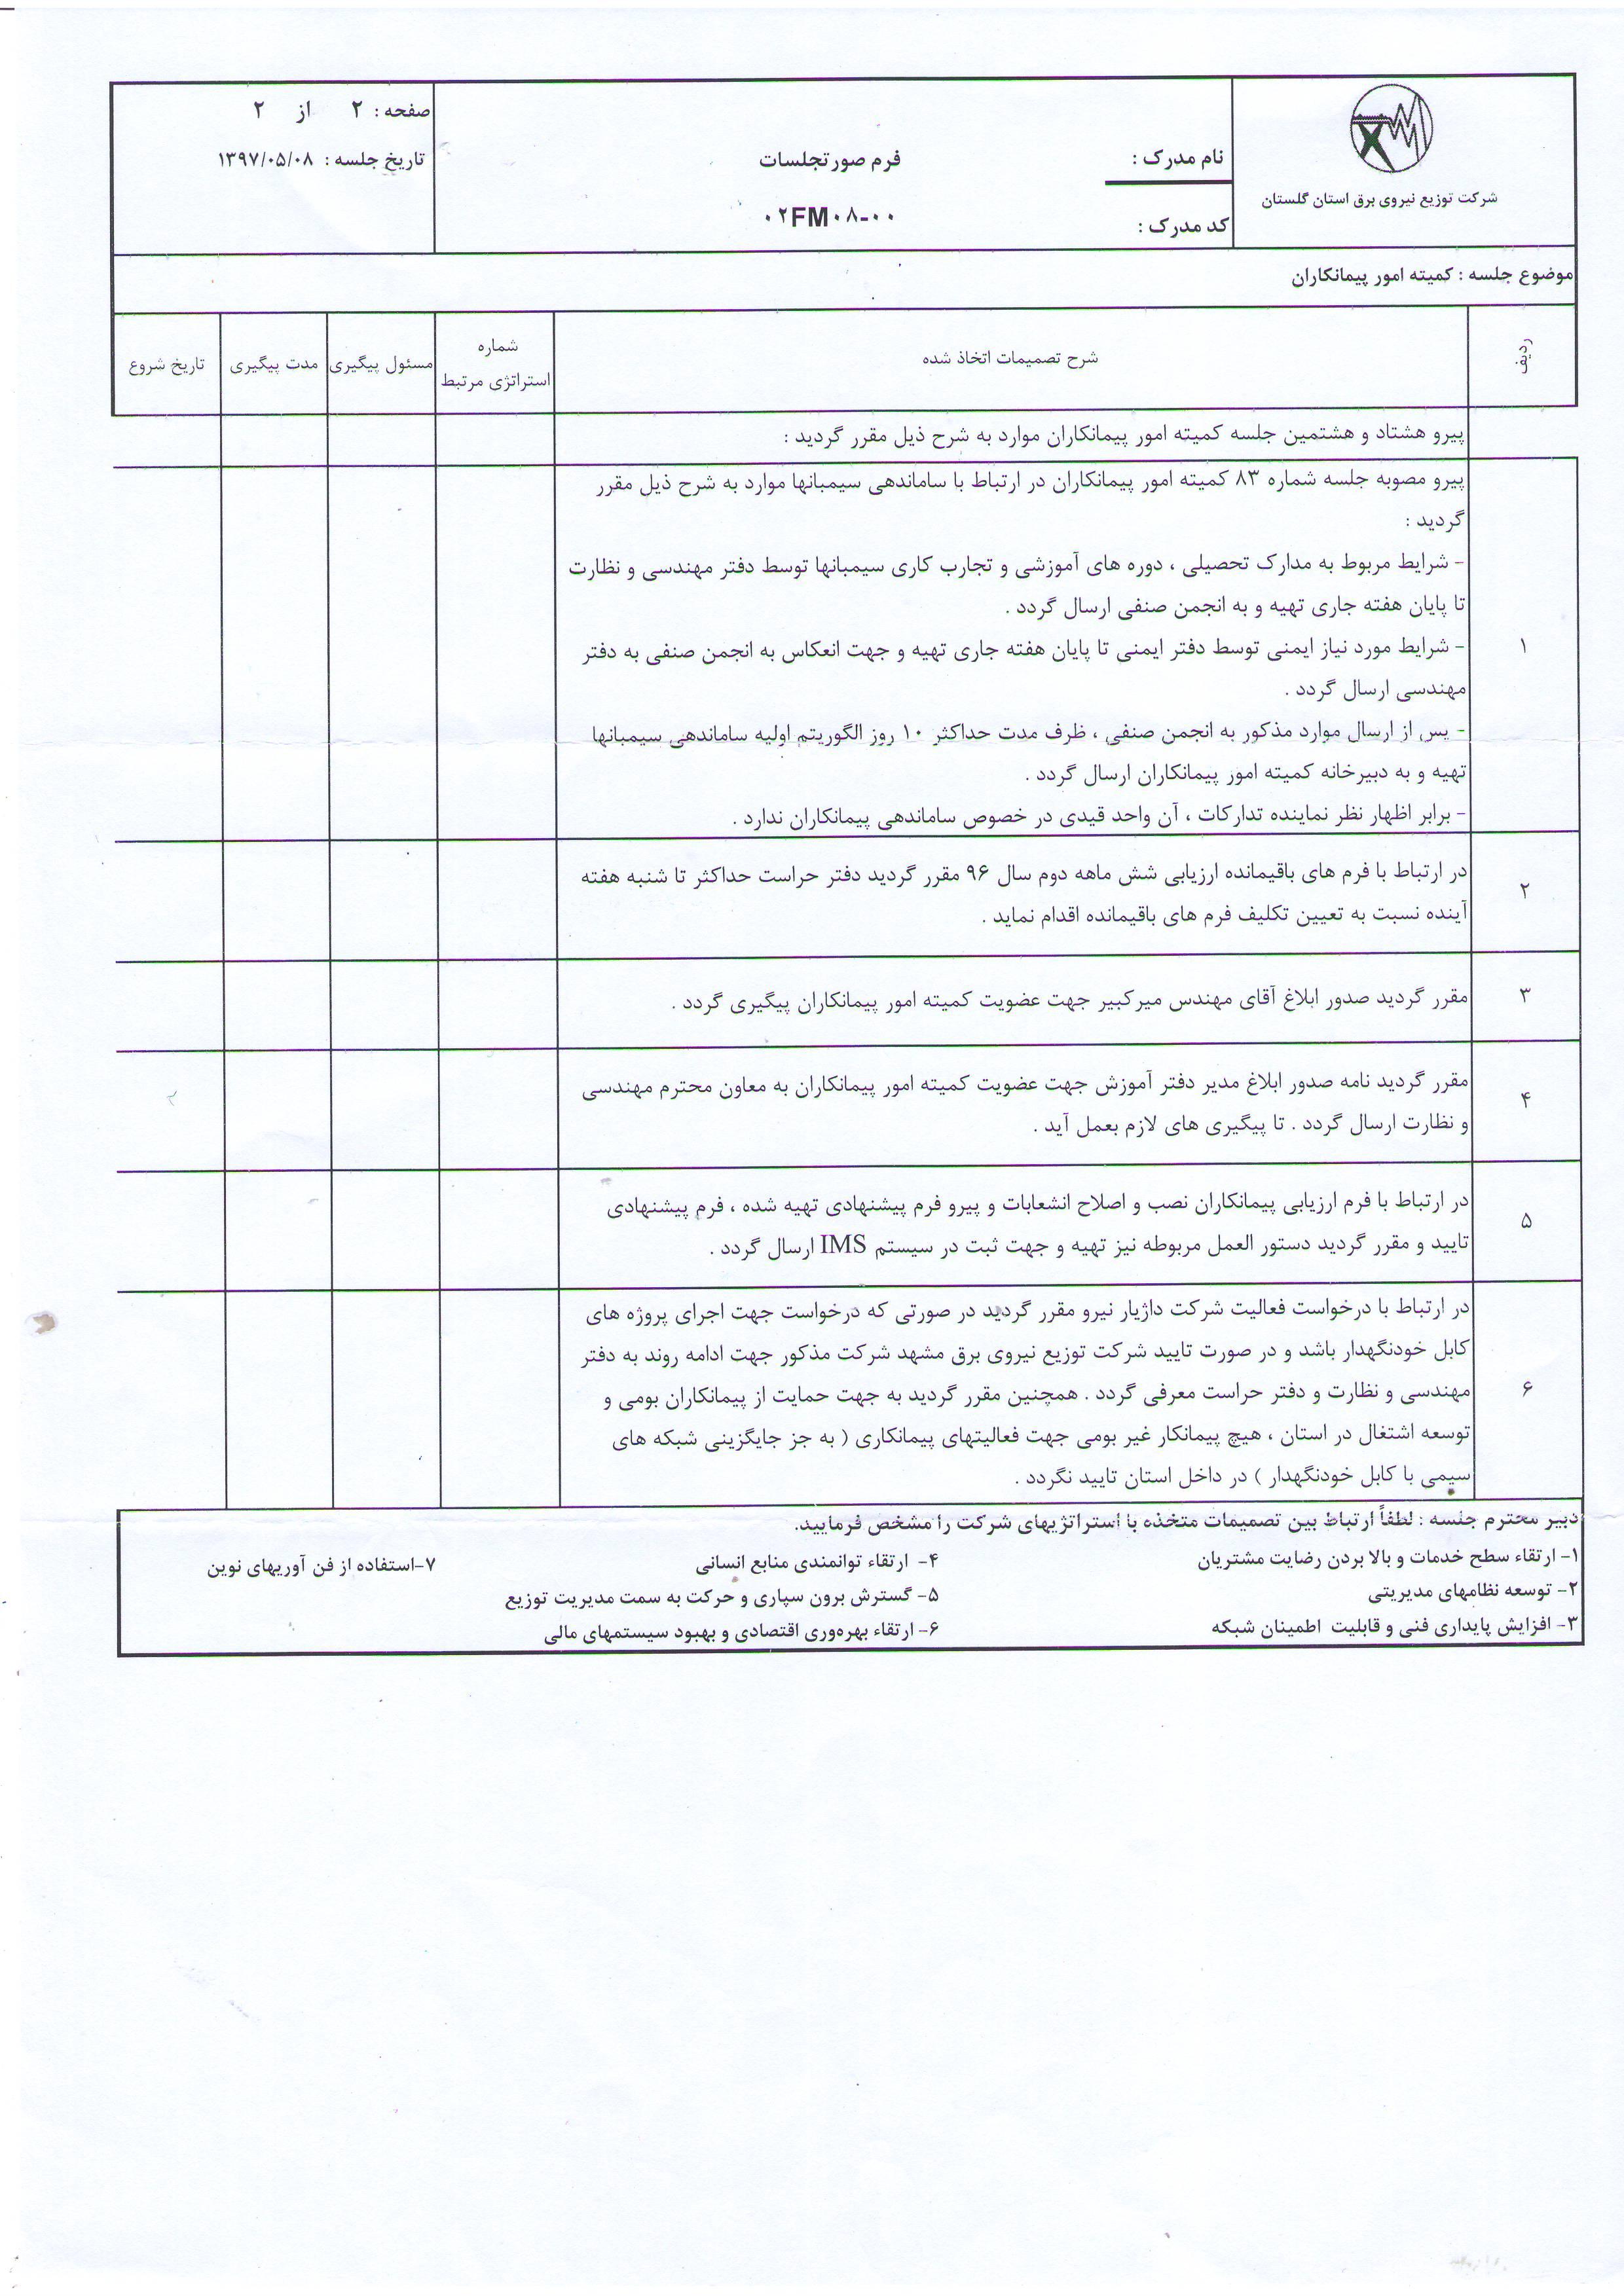 صورتجلسه شماره 88 کمیته امور پیمانکاران